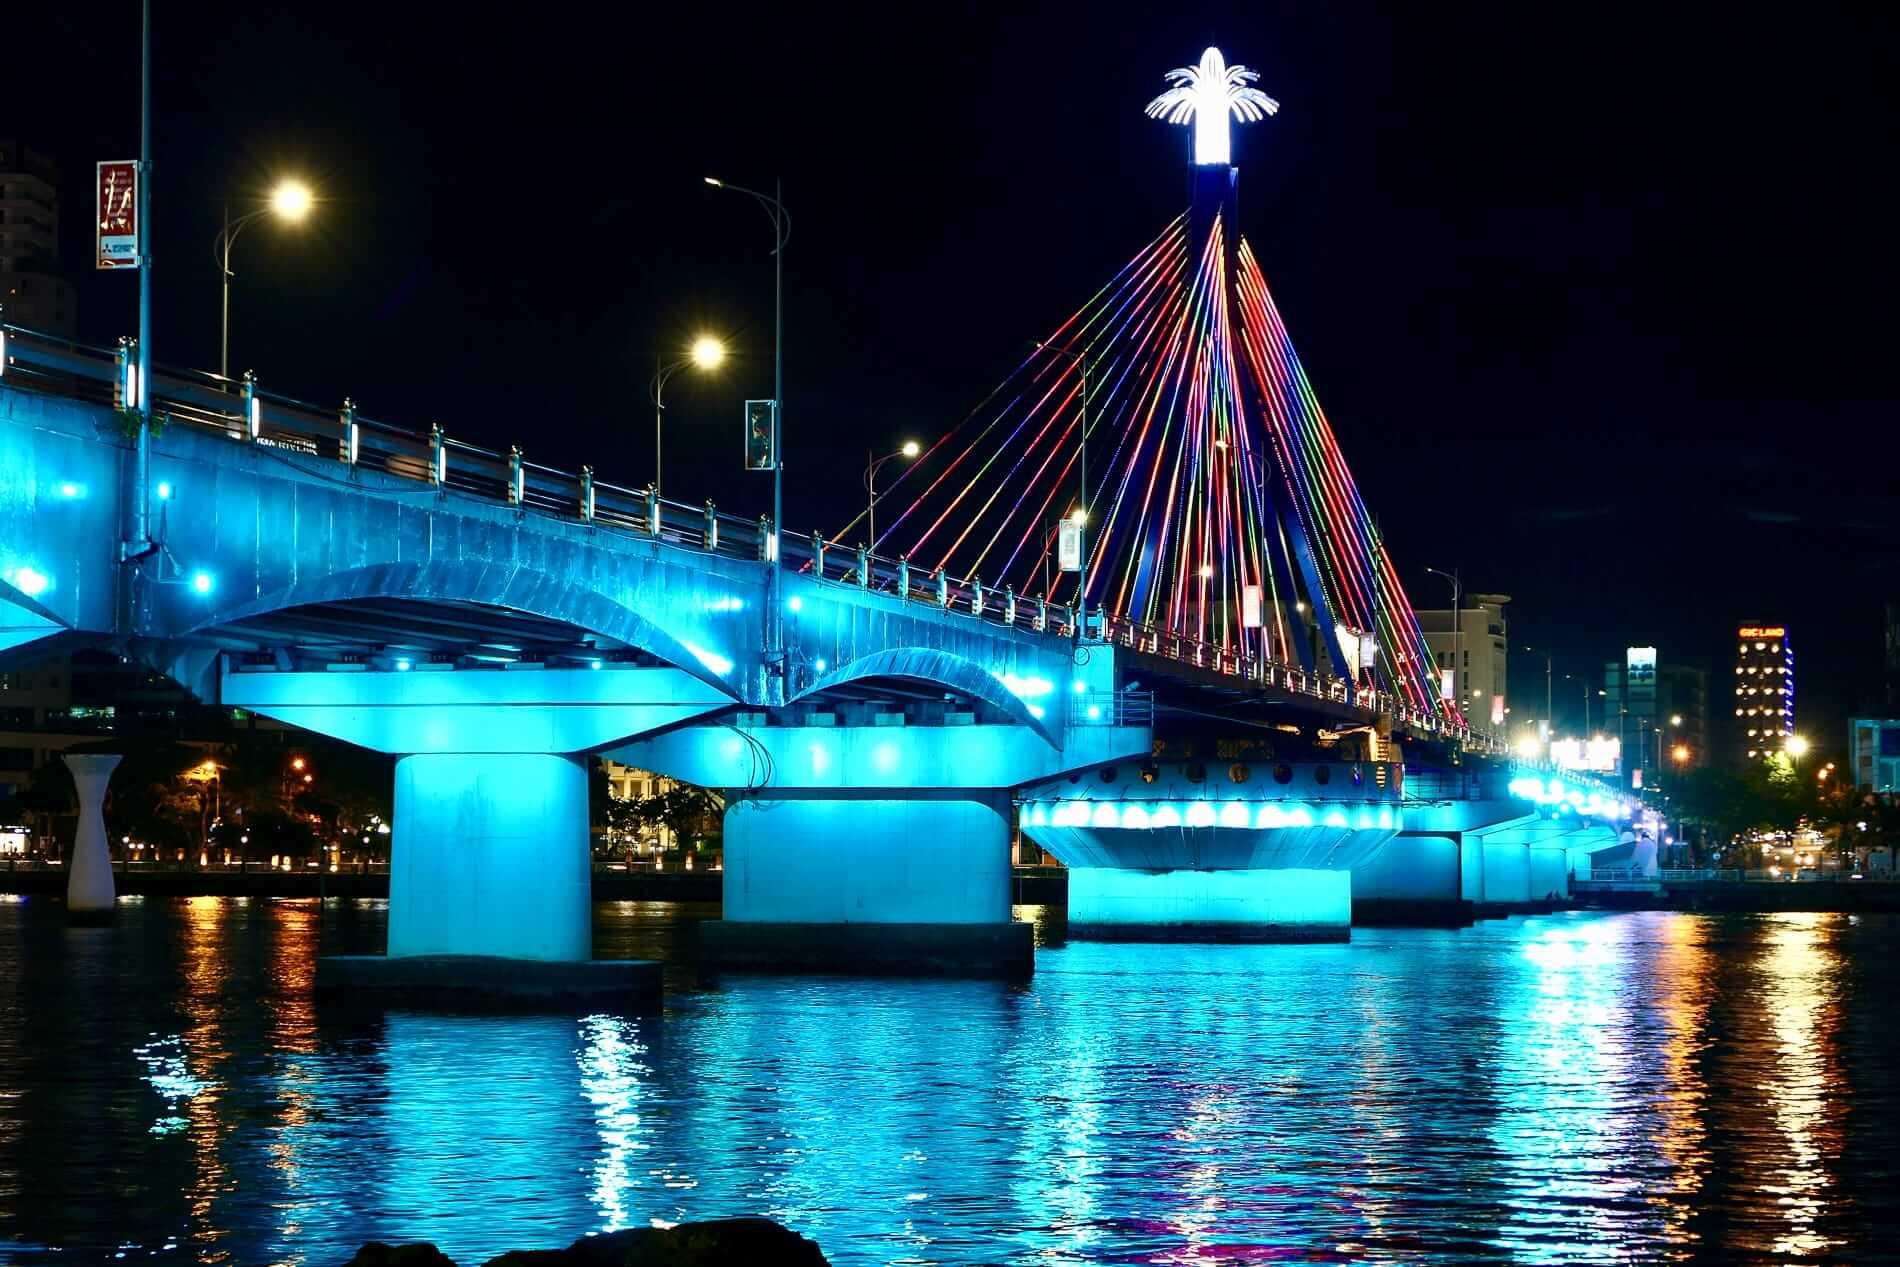 The Swing Bridge at night